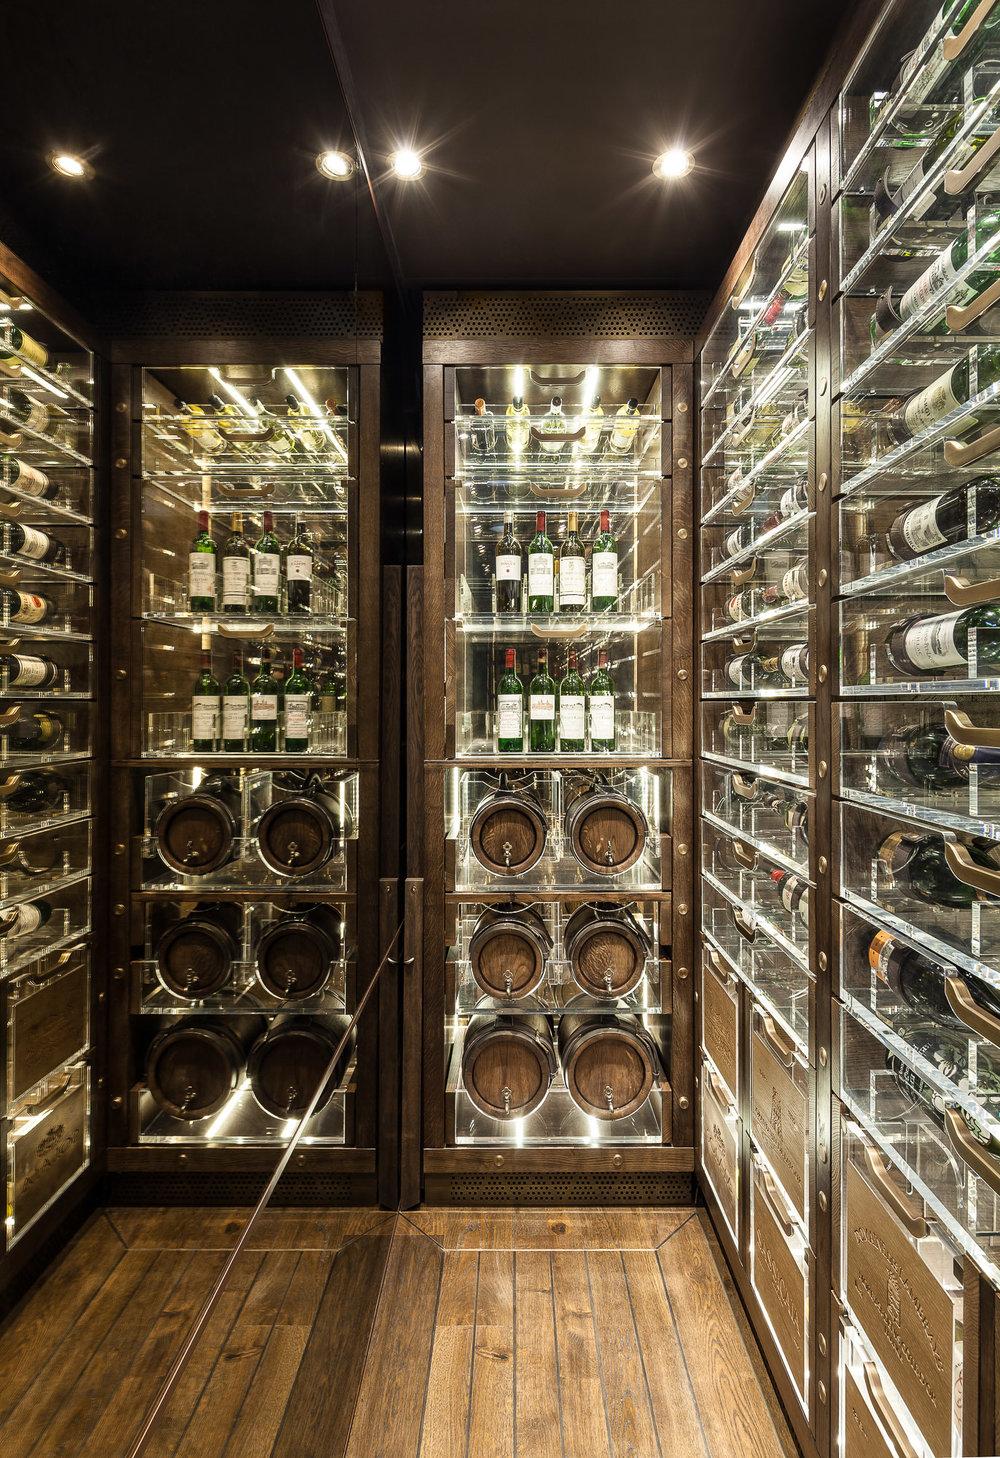 20170313_yacht_wine_cellar_0031.jpg